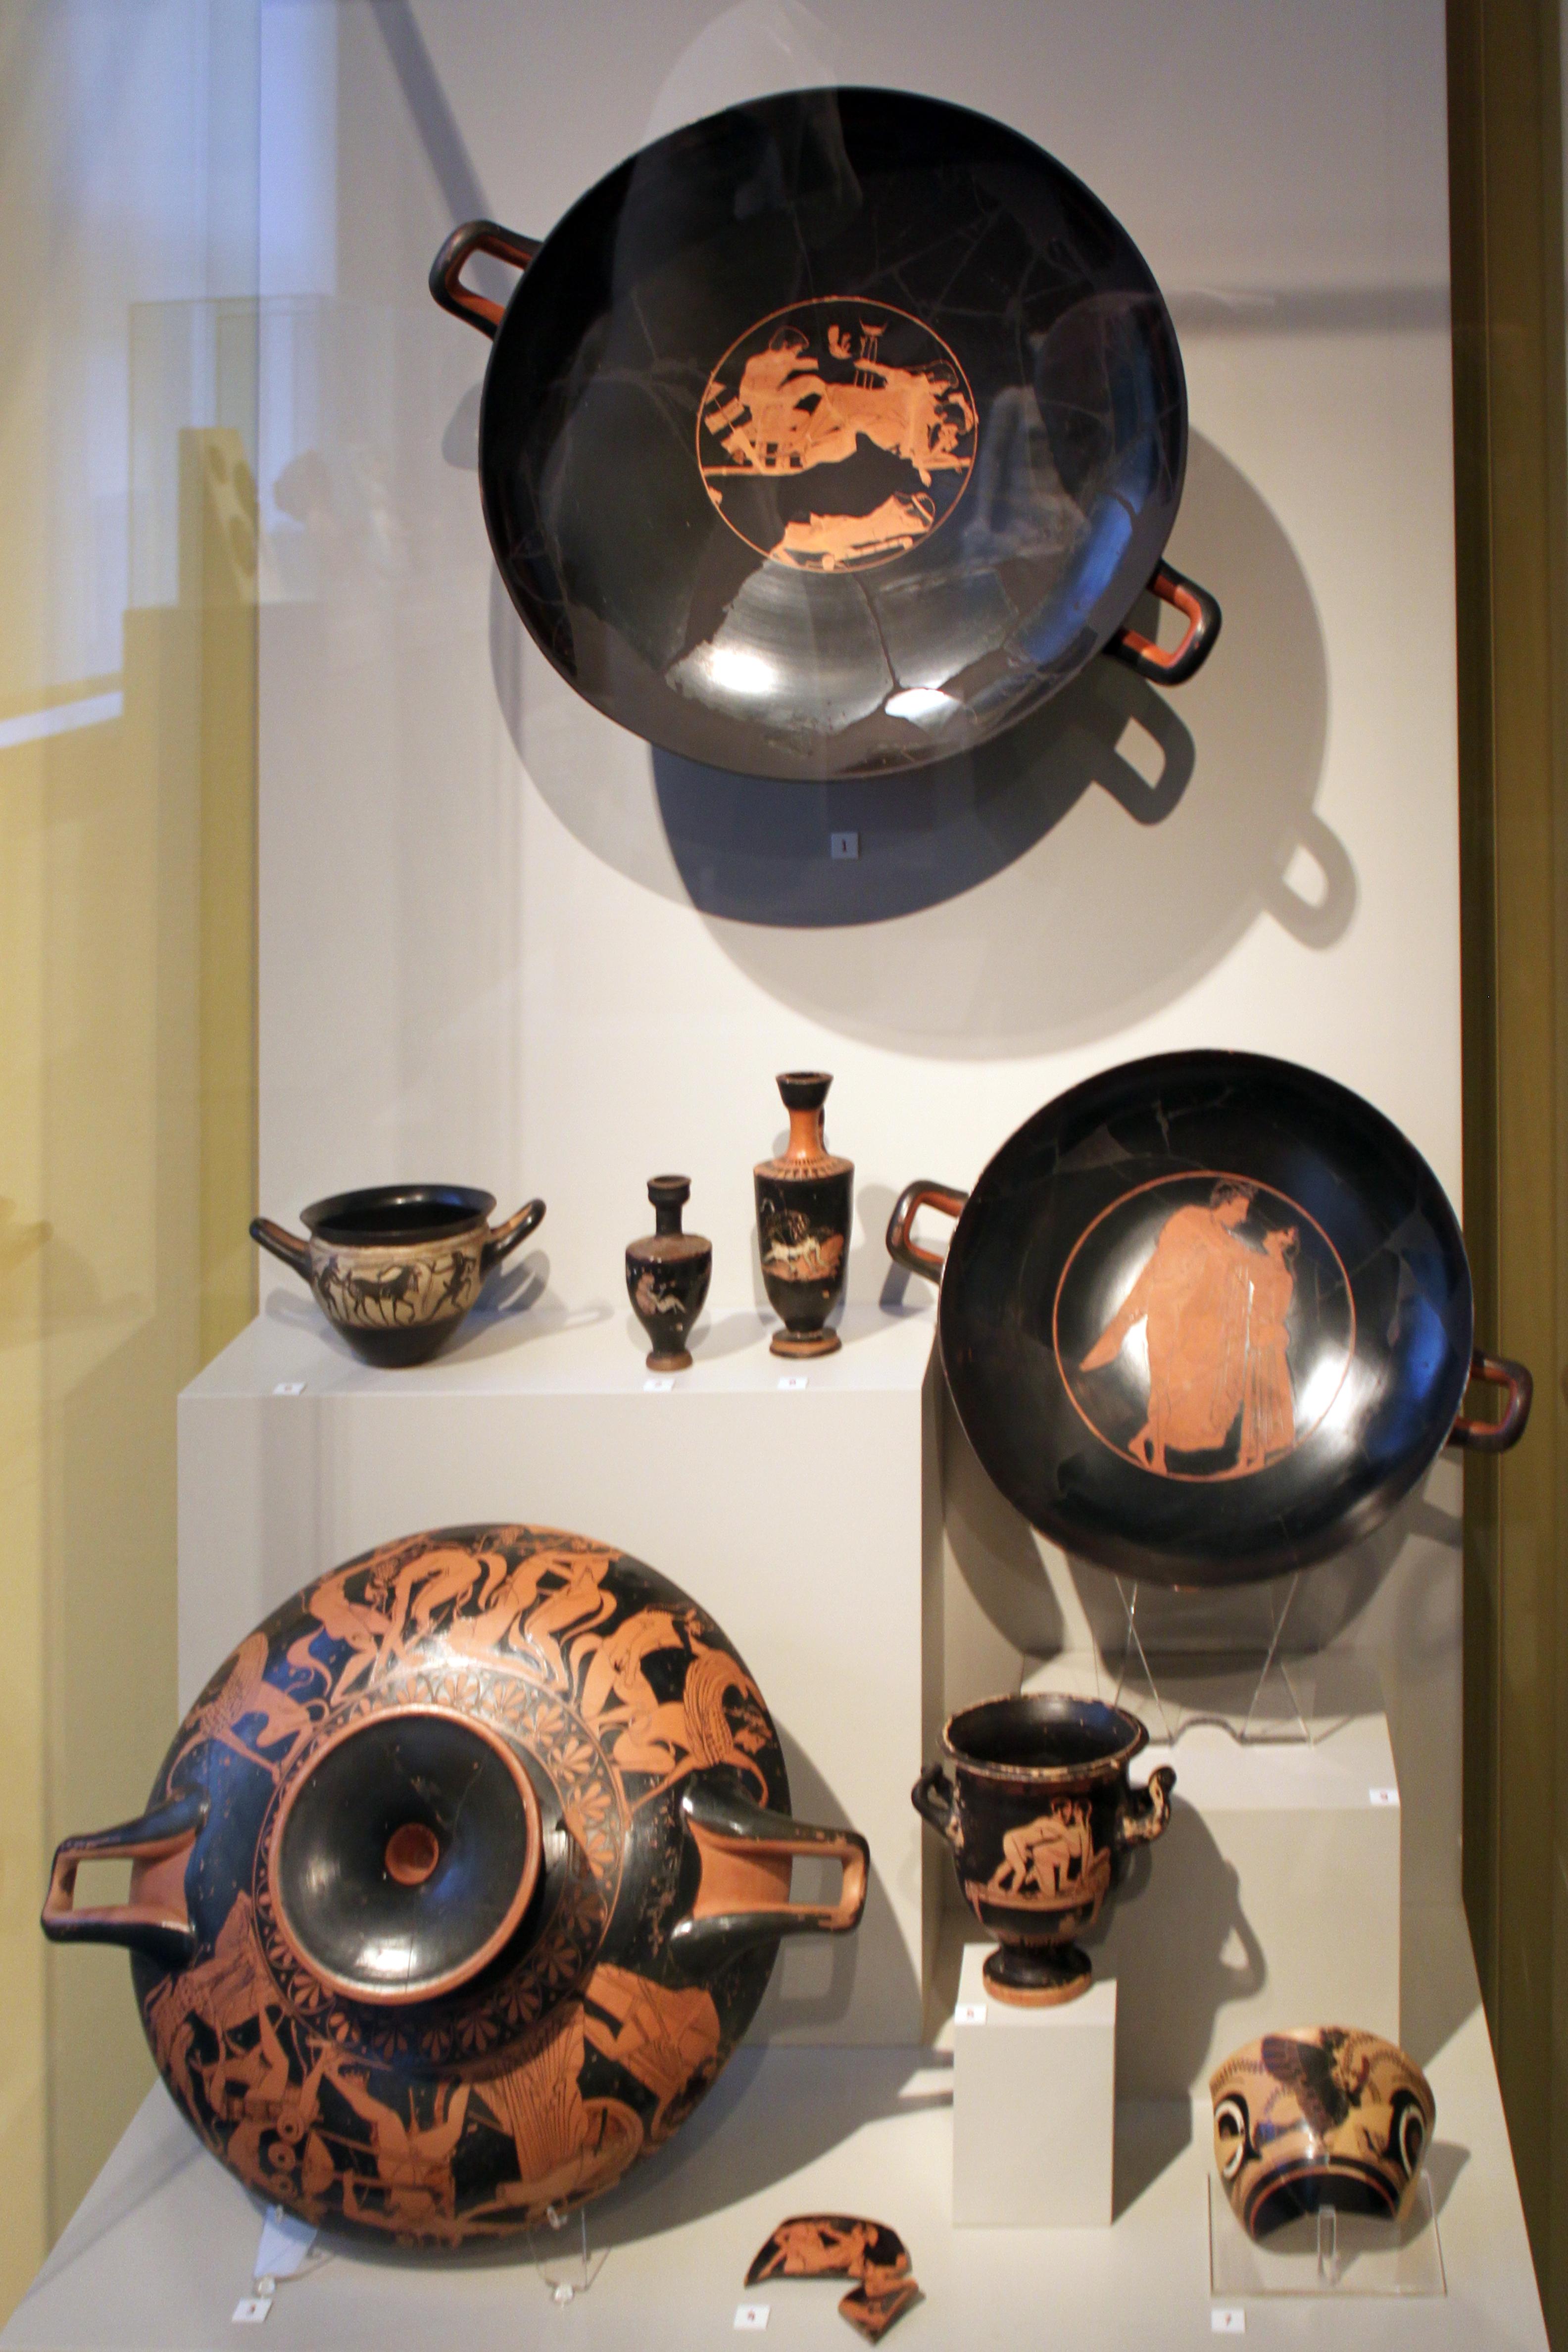 File2014-01-26 Symposium Tableware with erotic motif 00 Altes Museum anagoria & File:2014-01-26 Symposium Tableware with erotic motif 00 Altes ...